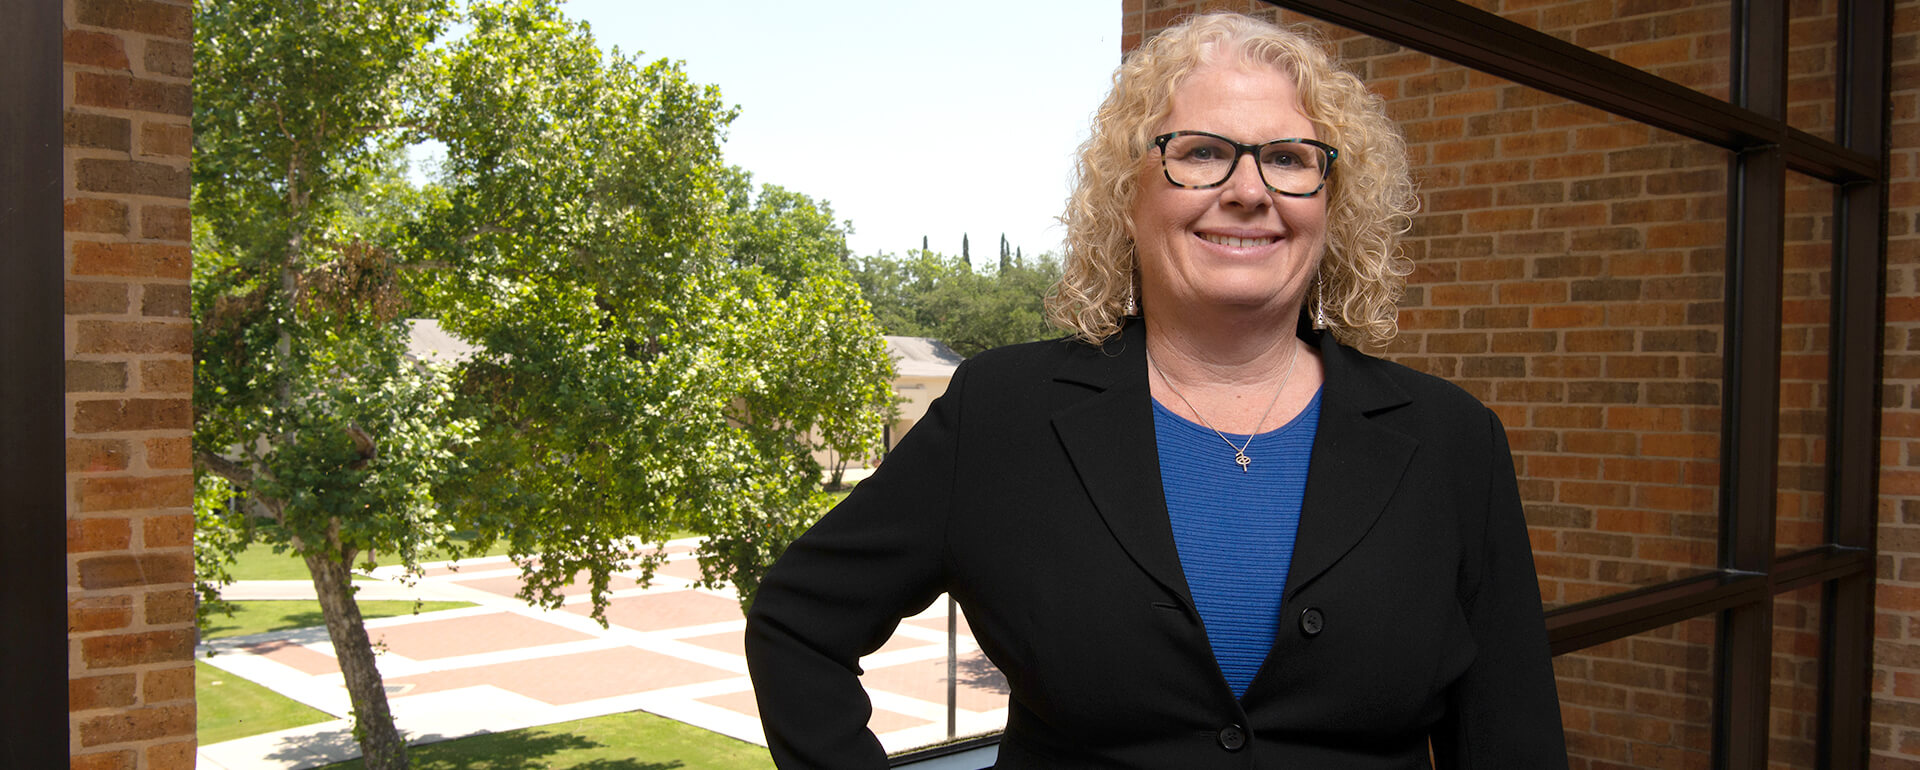 Stephanie Ward stands on an balcony overlooking Alkek Plaza.